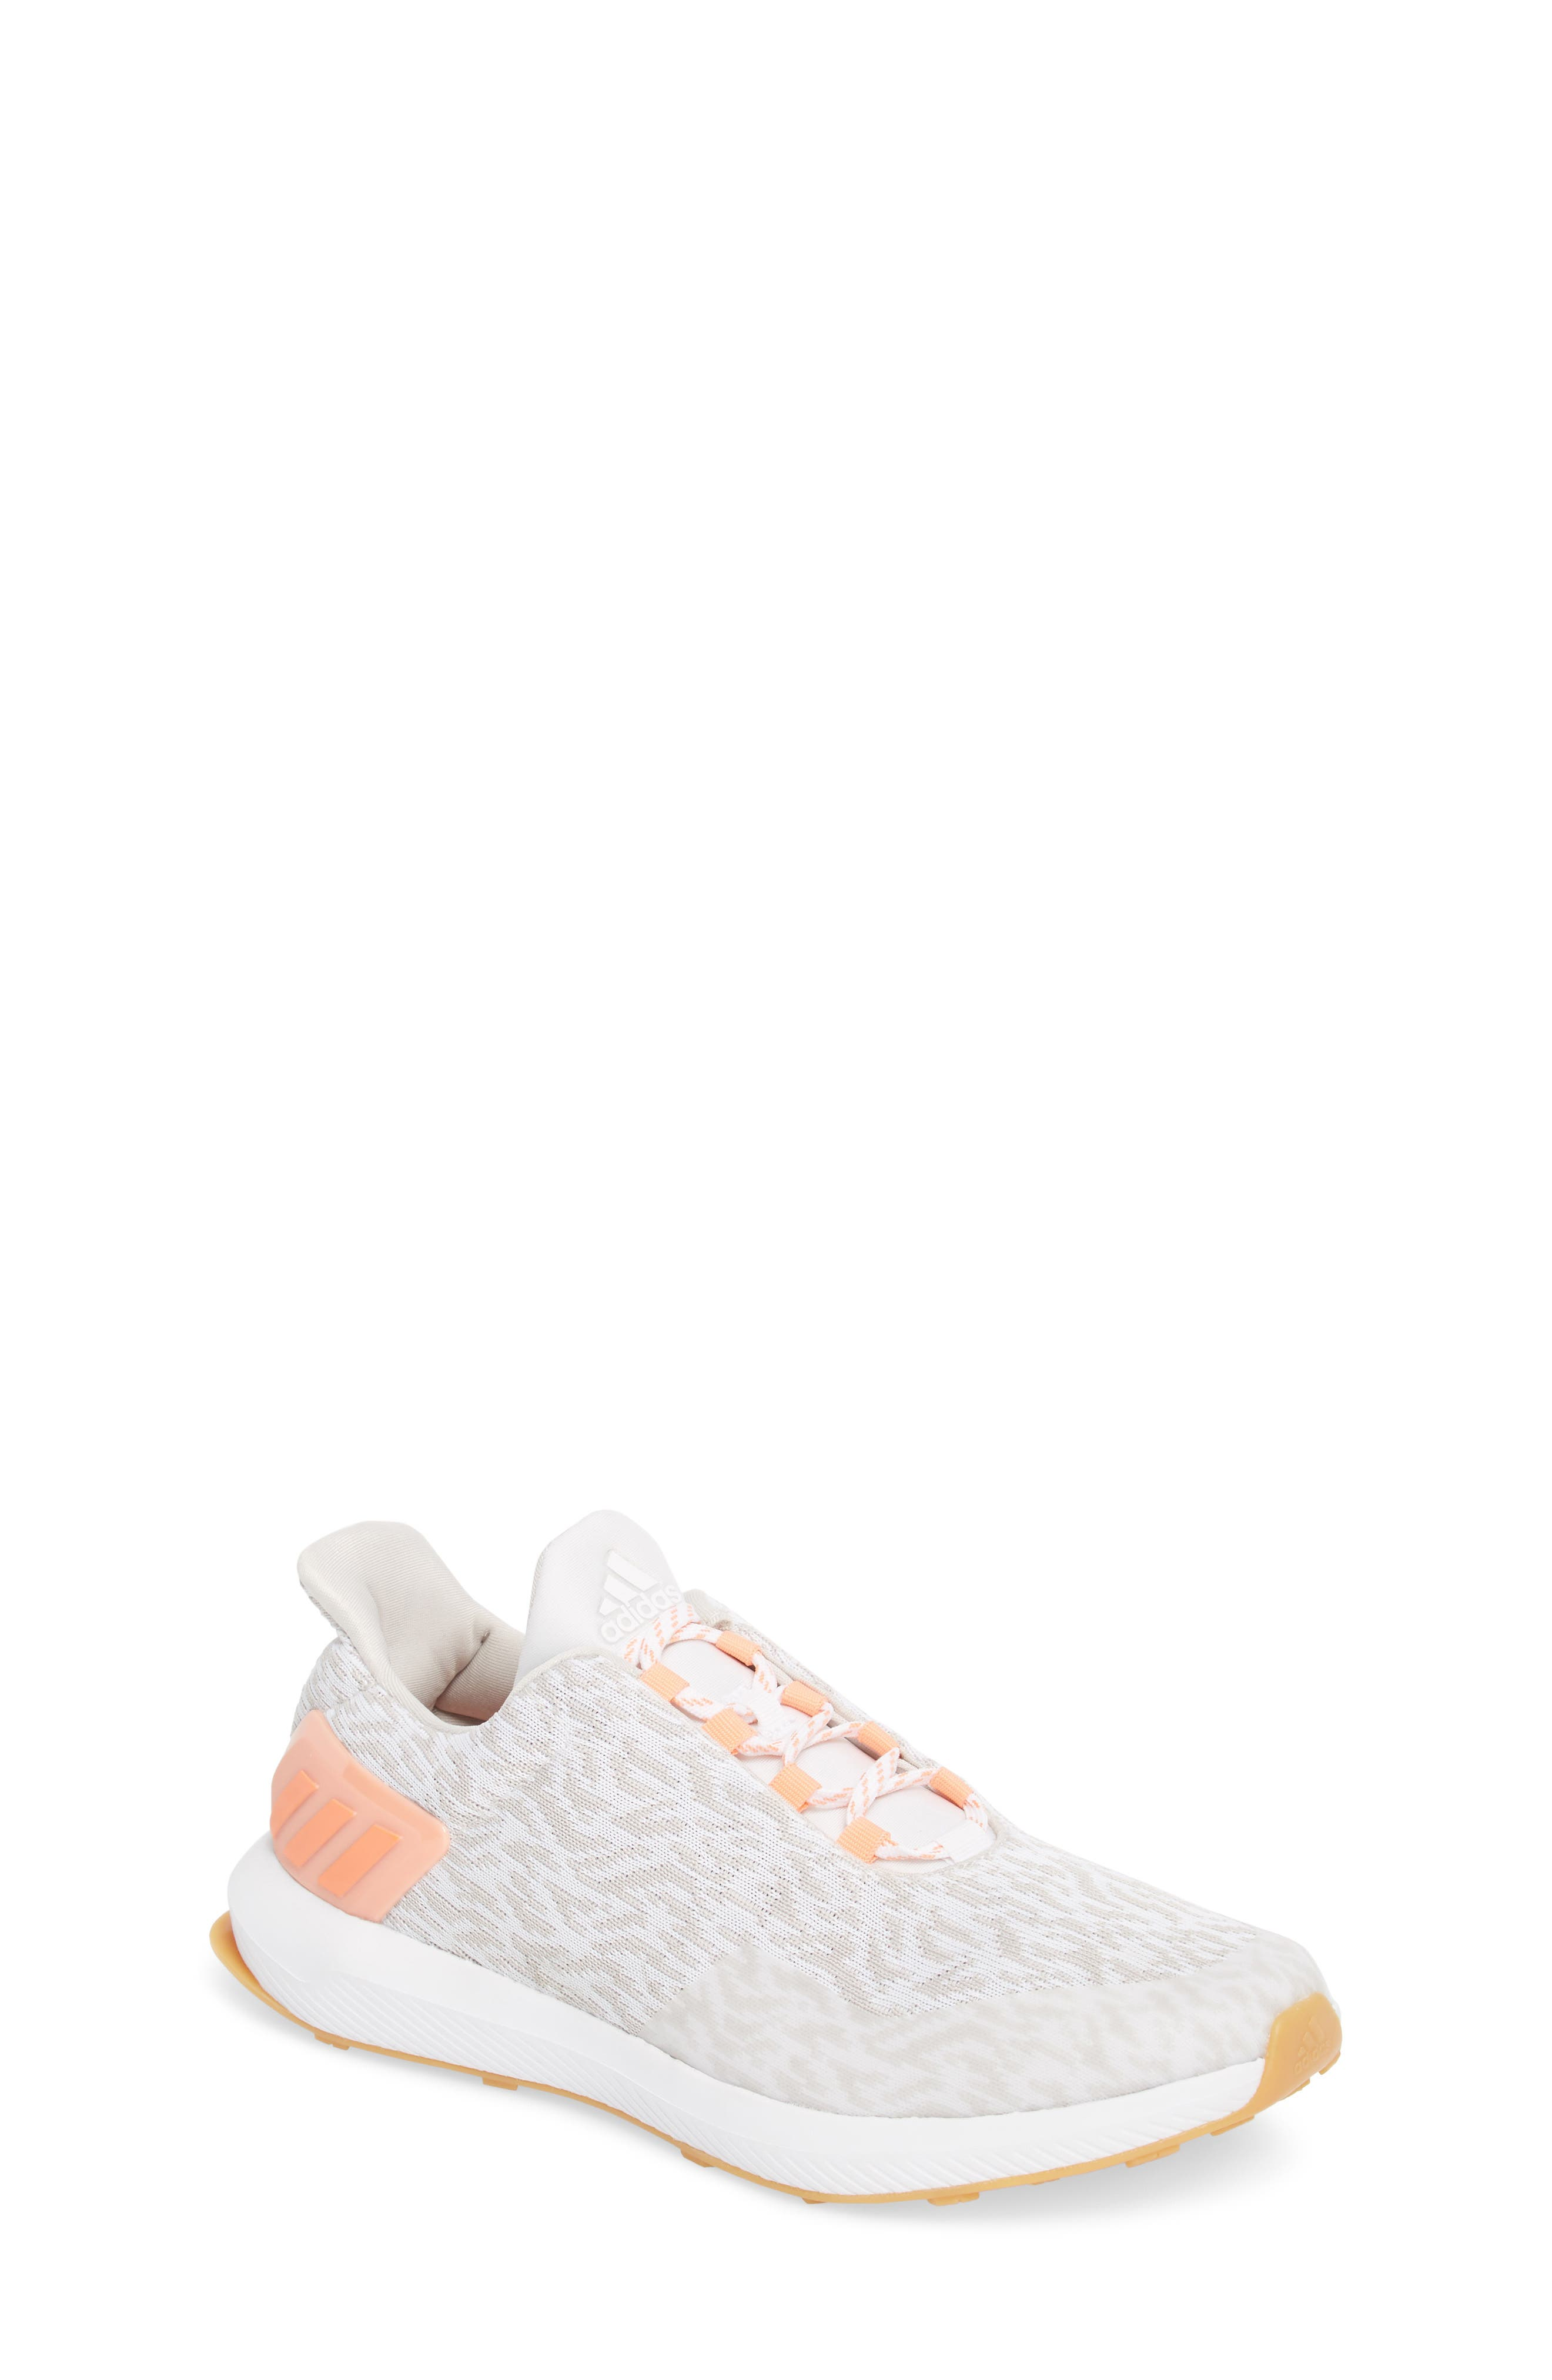 RapidaRun Uncaged Sneaker,                             Main thumbnail 1, color,                             021